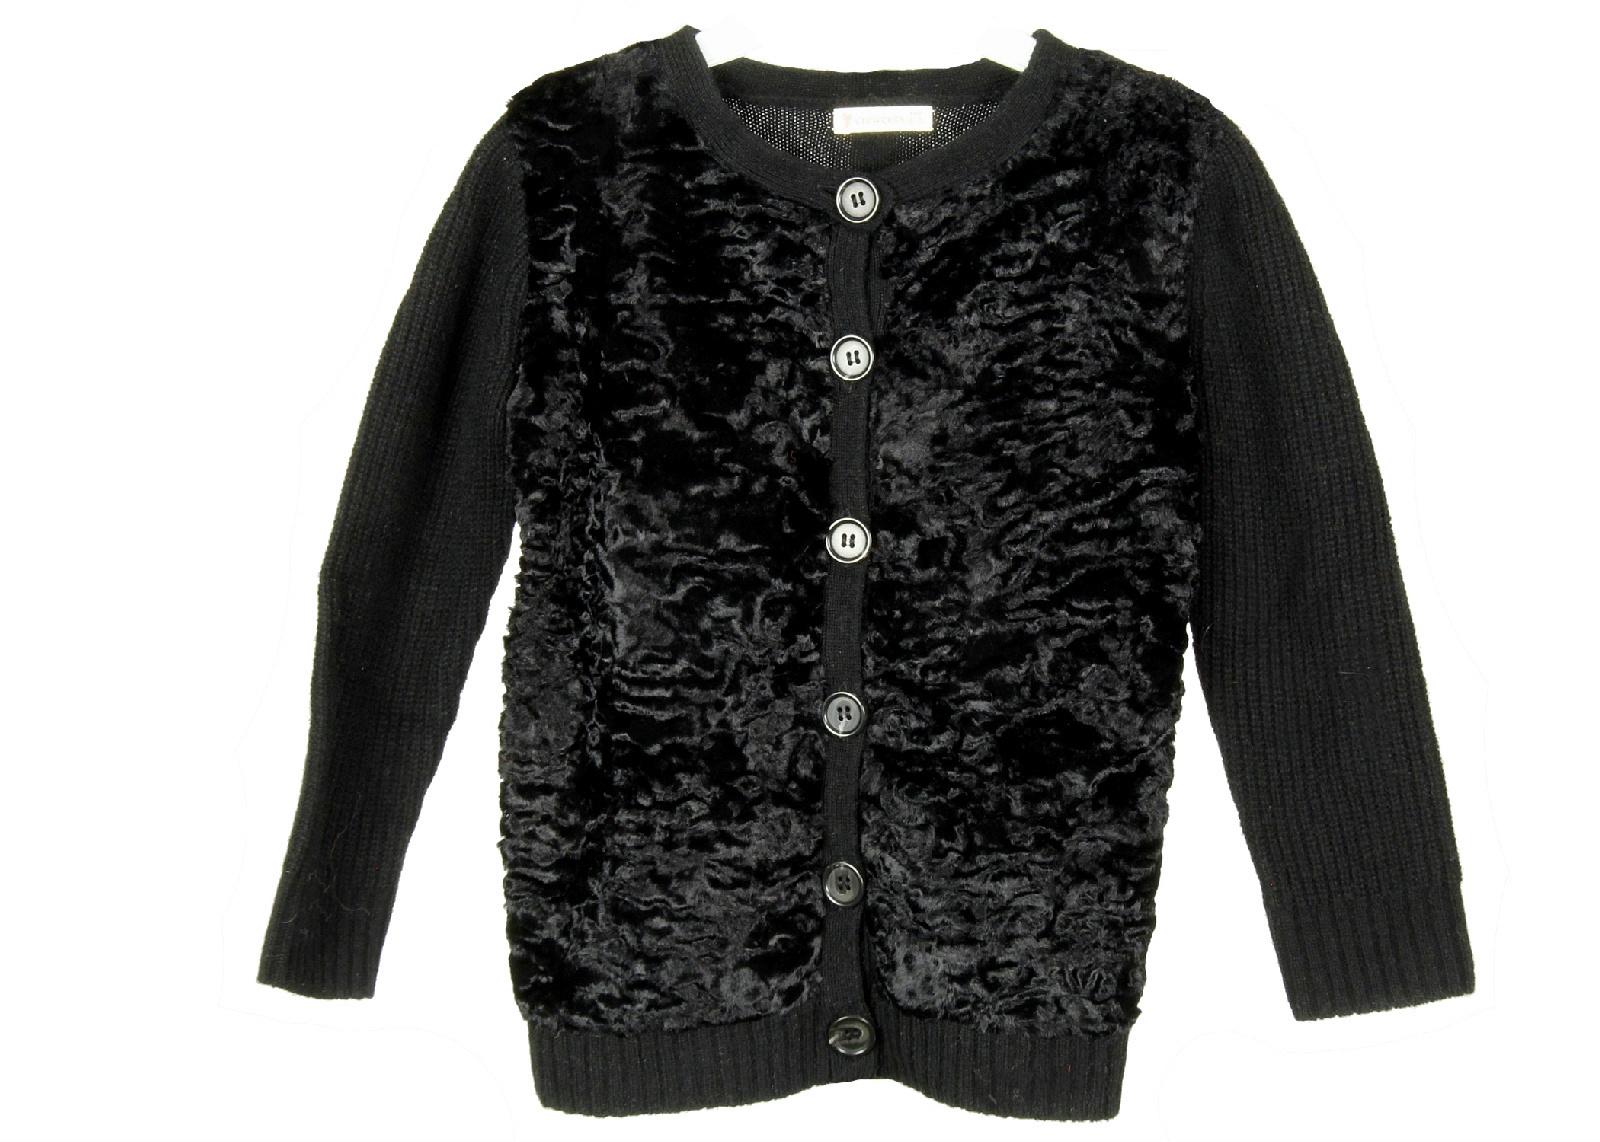 J Crew Kids Crewcuts Fuzzy Black Sweater Cardigan Sz 4/5 Black - $27.59